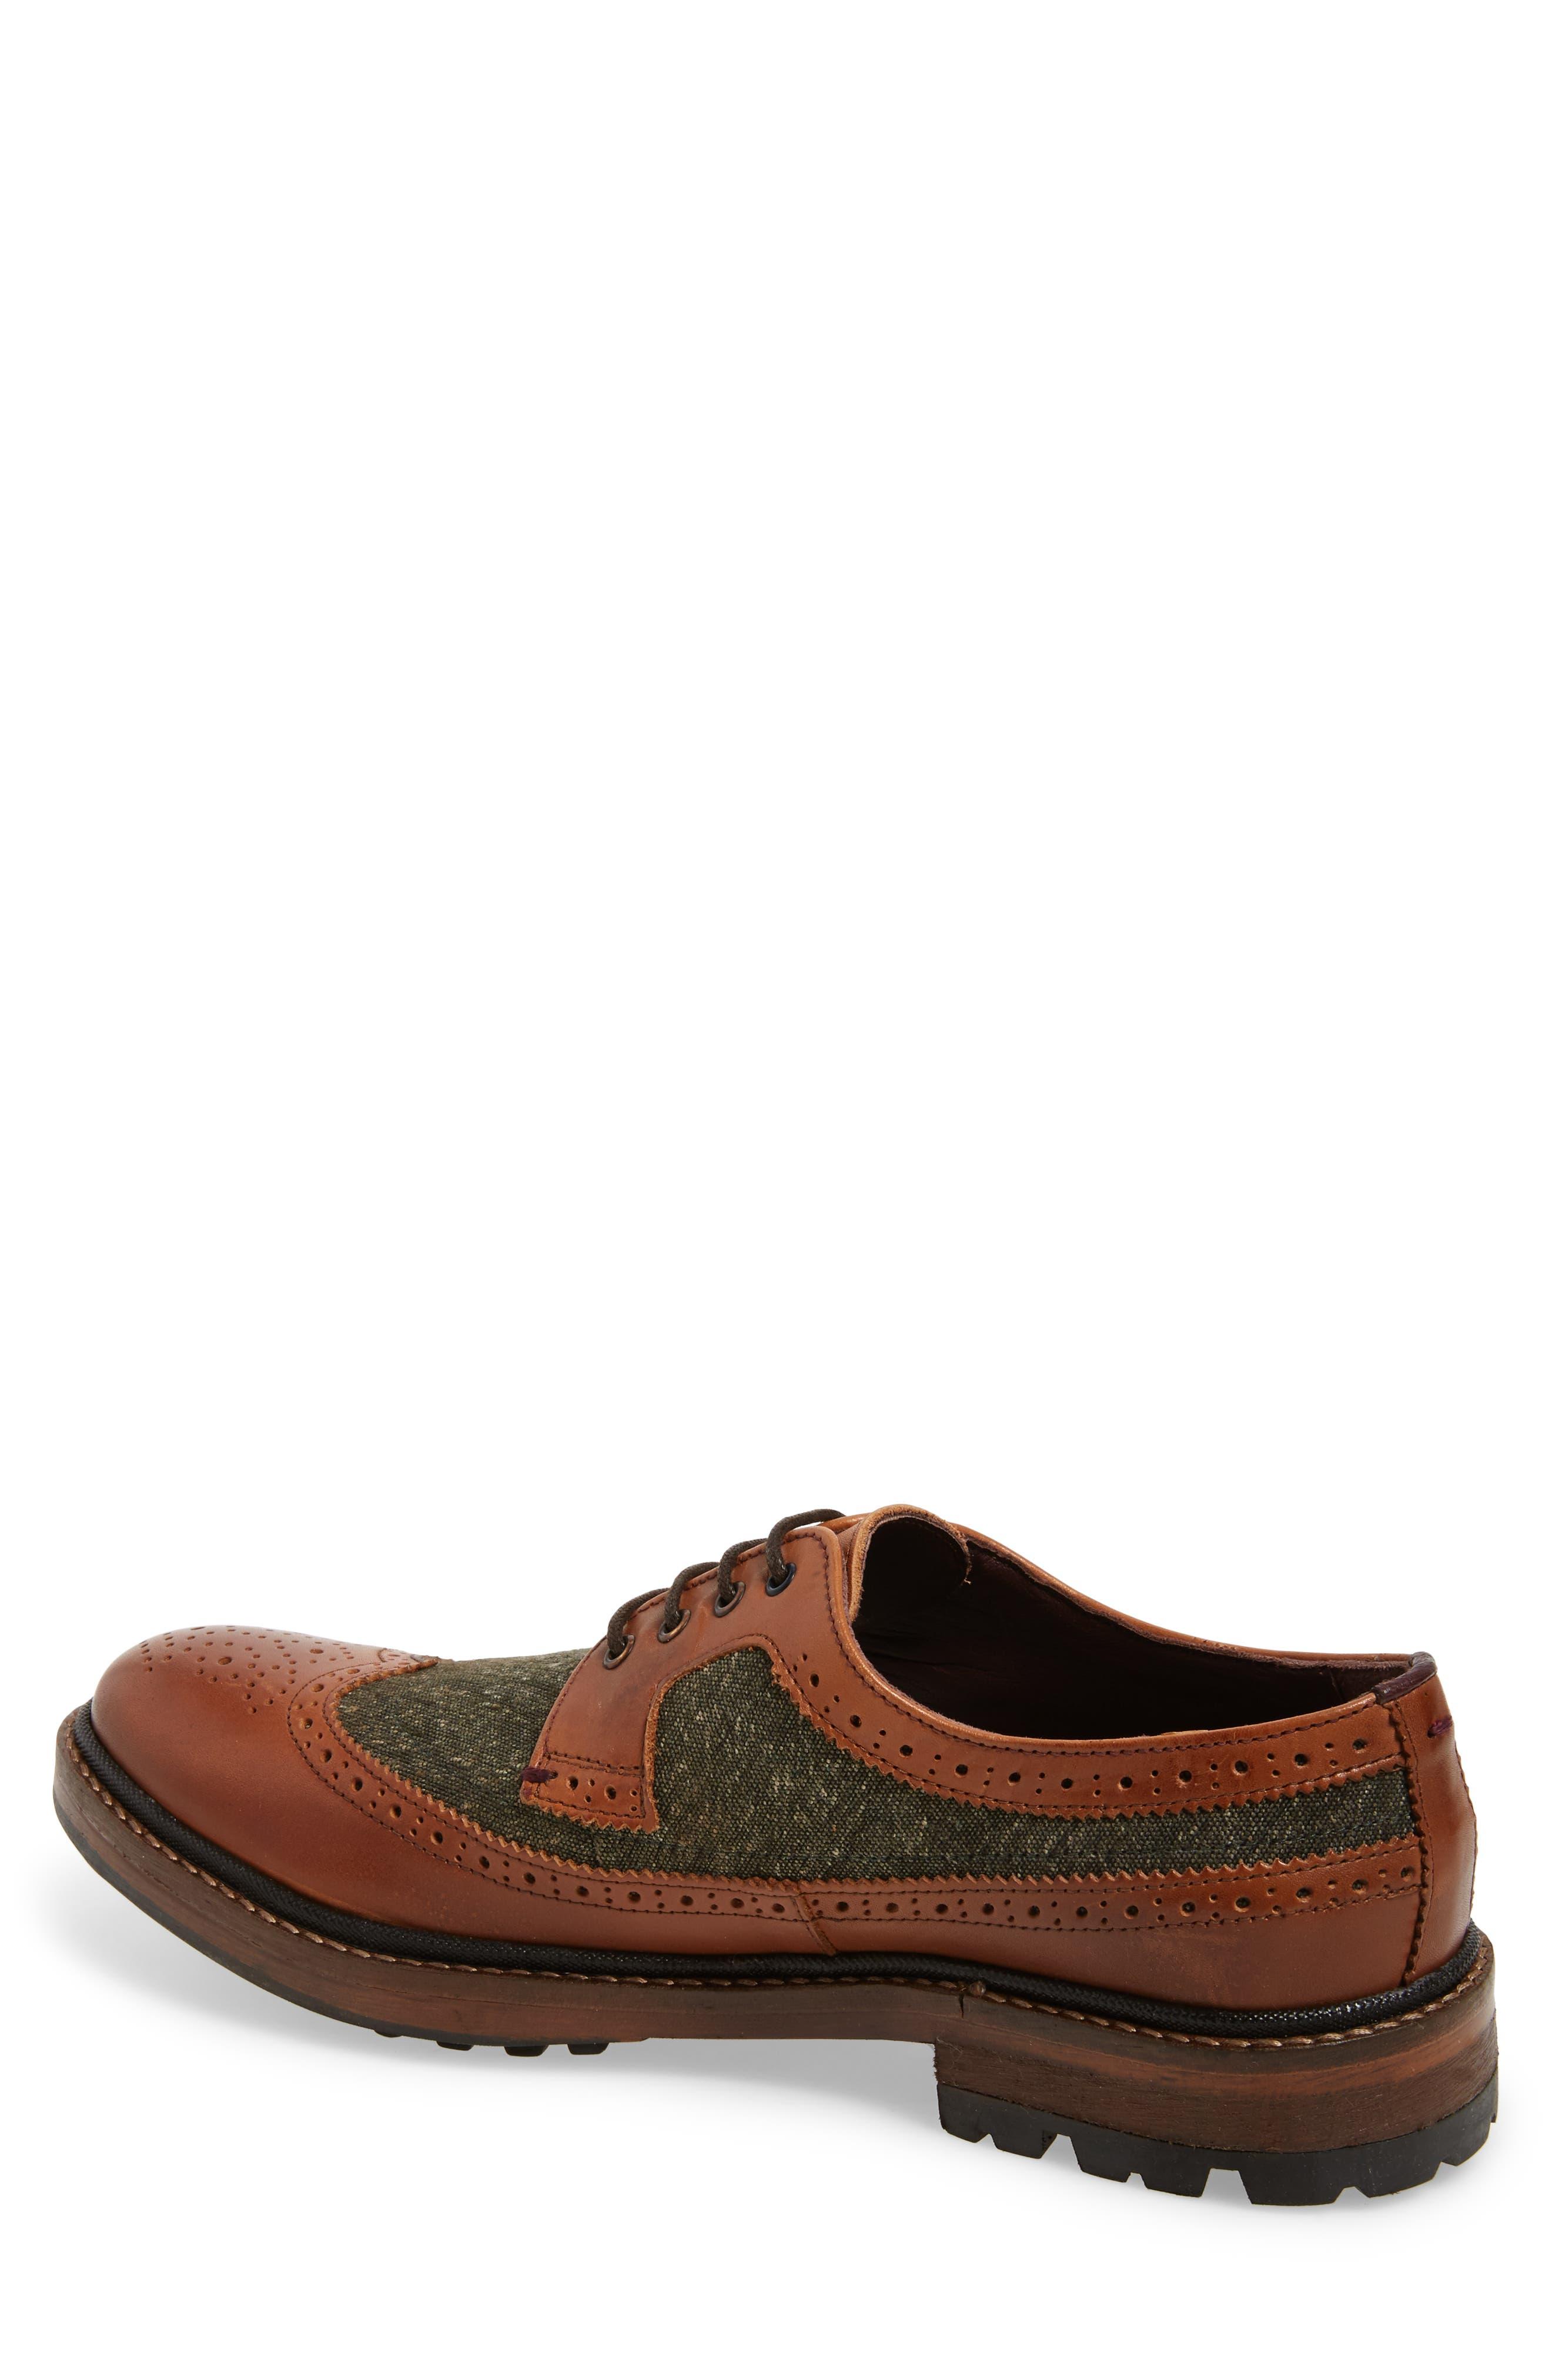 Casbo Spectator Shoe,                             Alternate thumbnail 4, color,